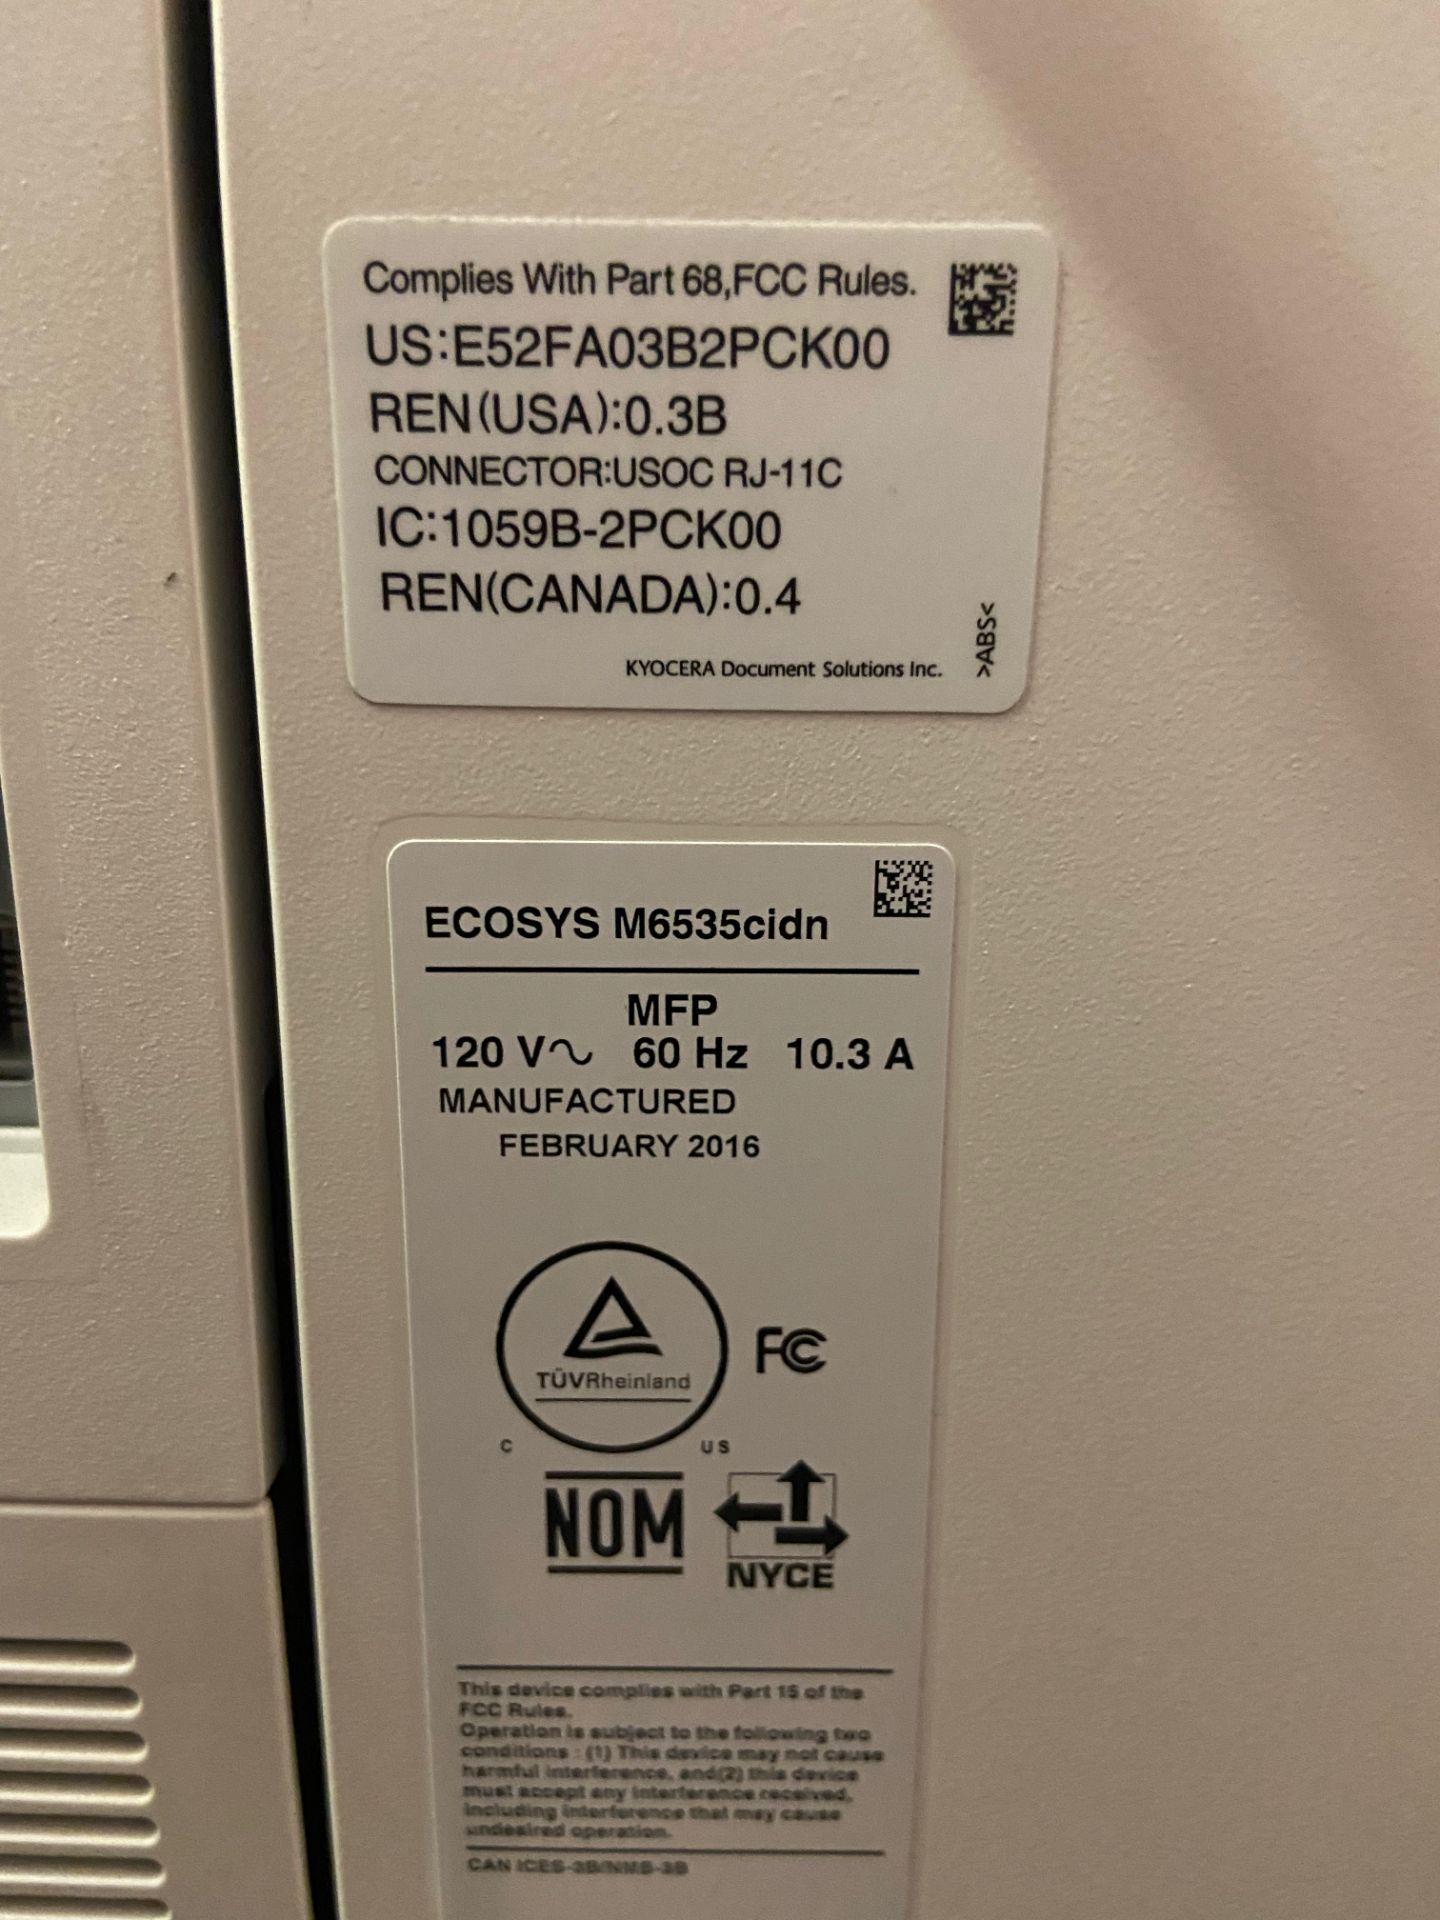 Kyocera Ecosys Printer, Model# M6535cidn, 120V, 60 Hz, Loading/Removal Fee: $20 - Image 5 of 6